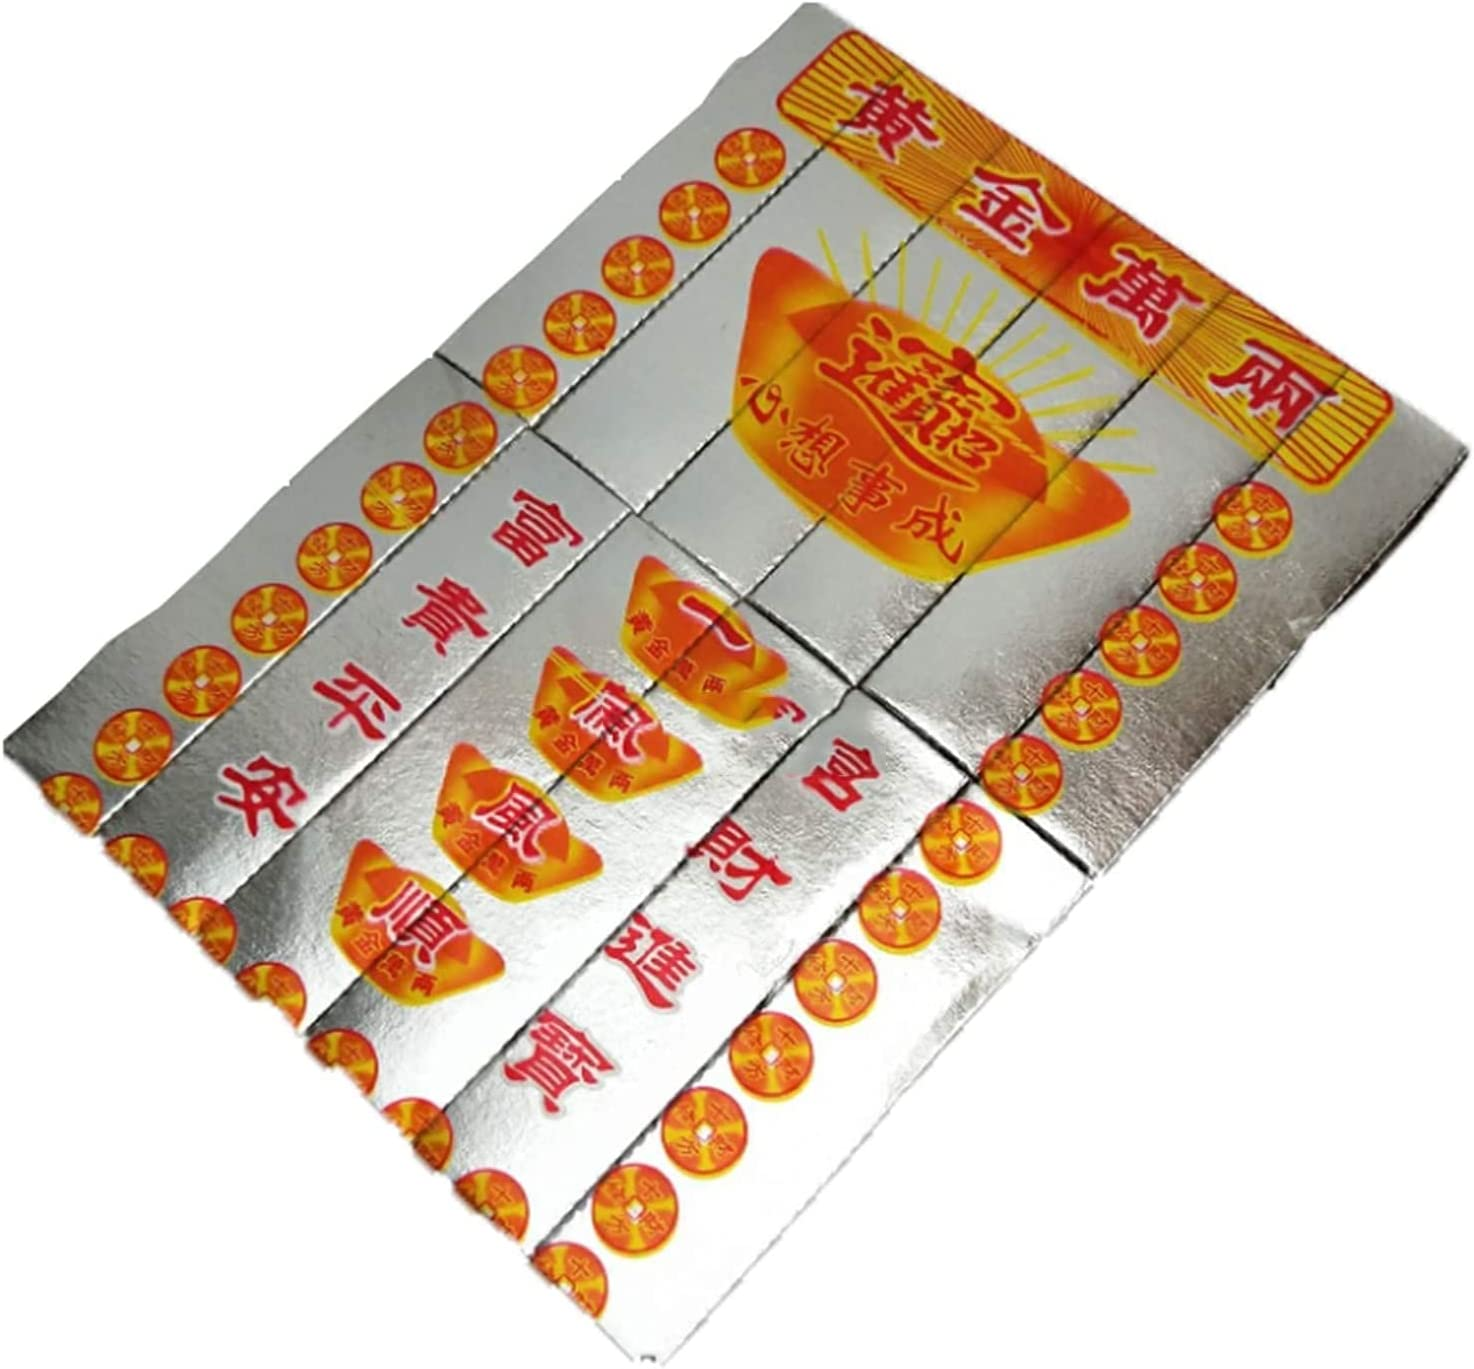 ZHANGQQ Ancestor Money Tulsa Mall Chinese Burning offerings Ranking TOP14 Money-